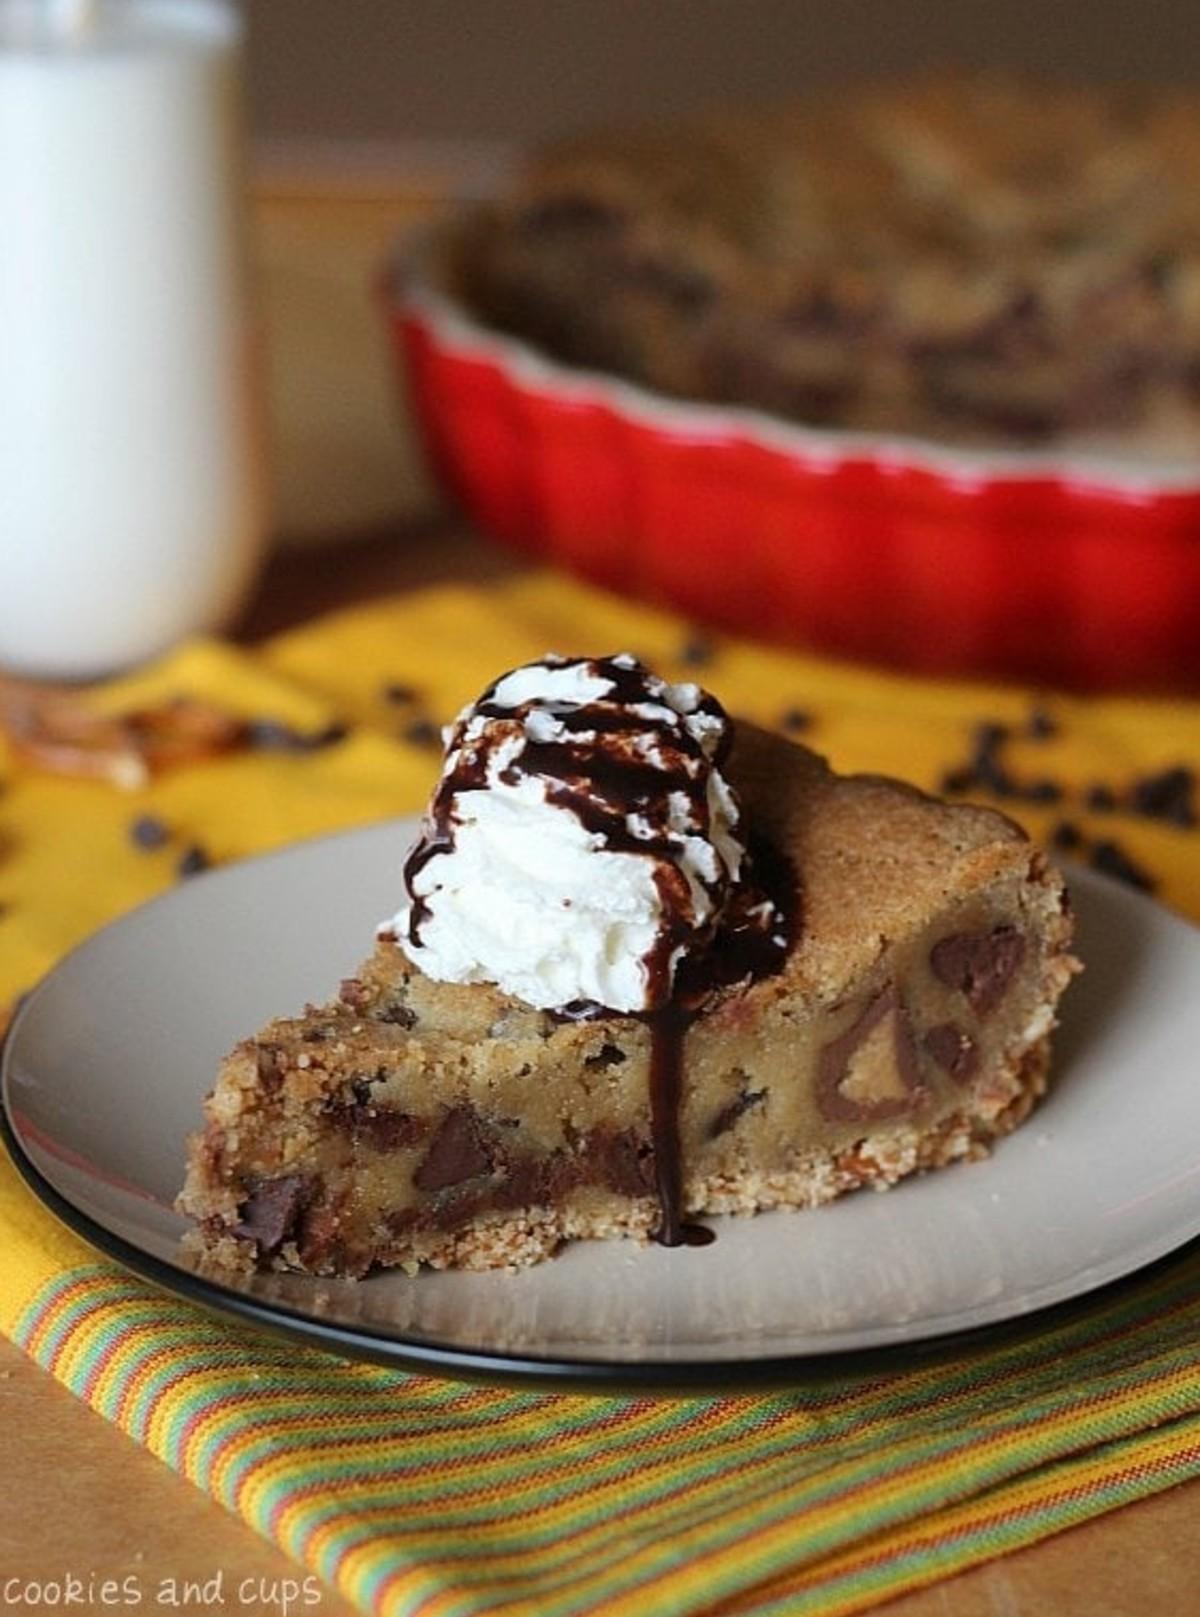 Pretzel Crusted Peanut Butter Cup Blondie Pie